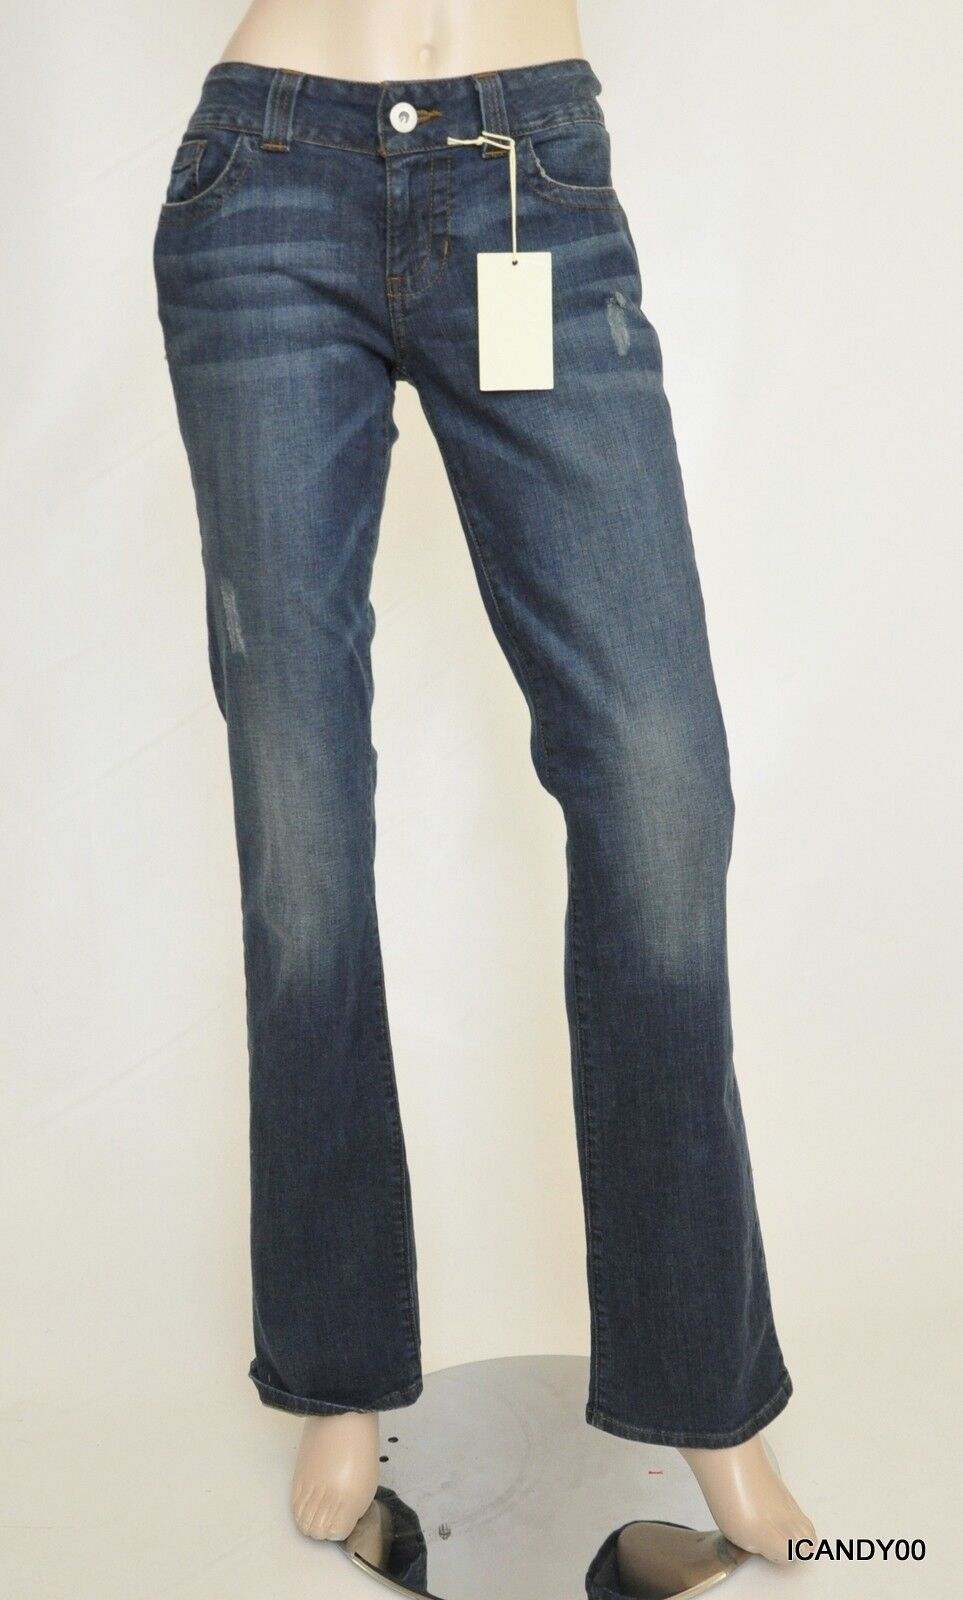 Nwt GUESS Bootcut Slim Fit Low Rise Stretch Jeans Denim Pants Santa Cruz 29 RG